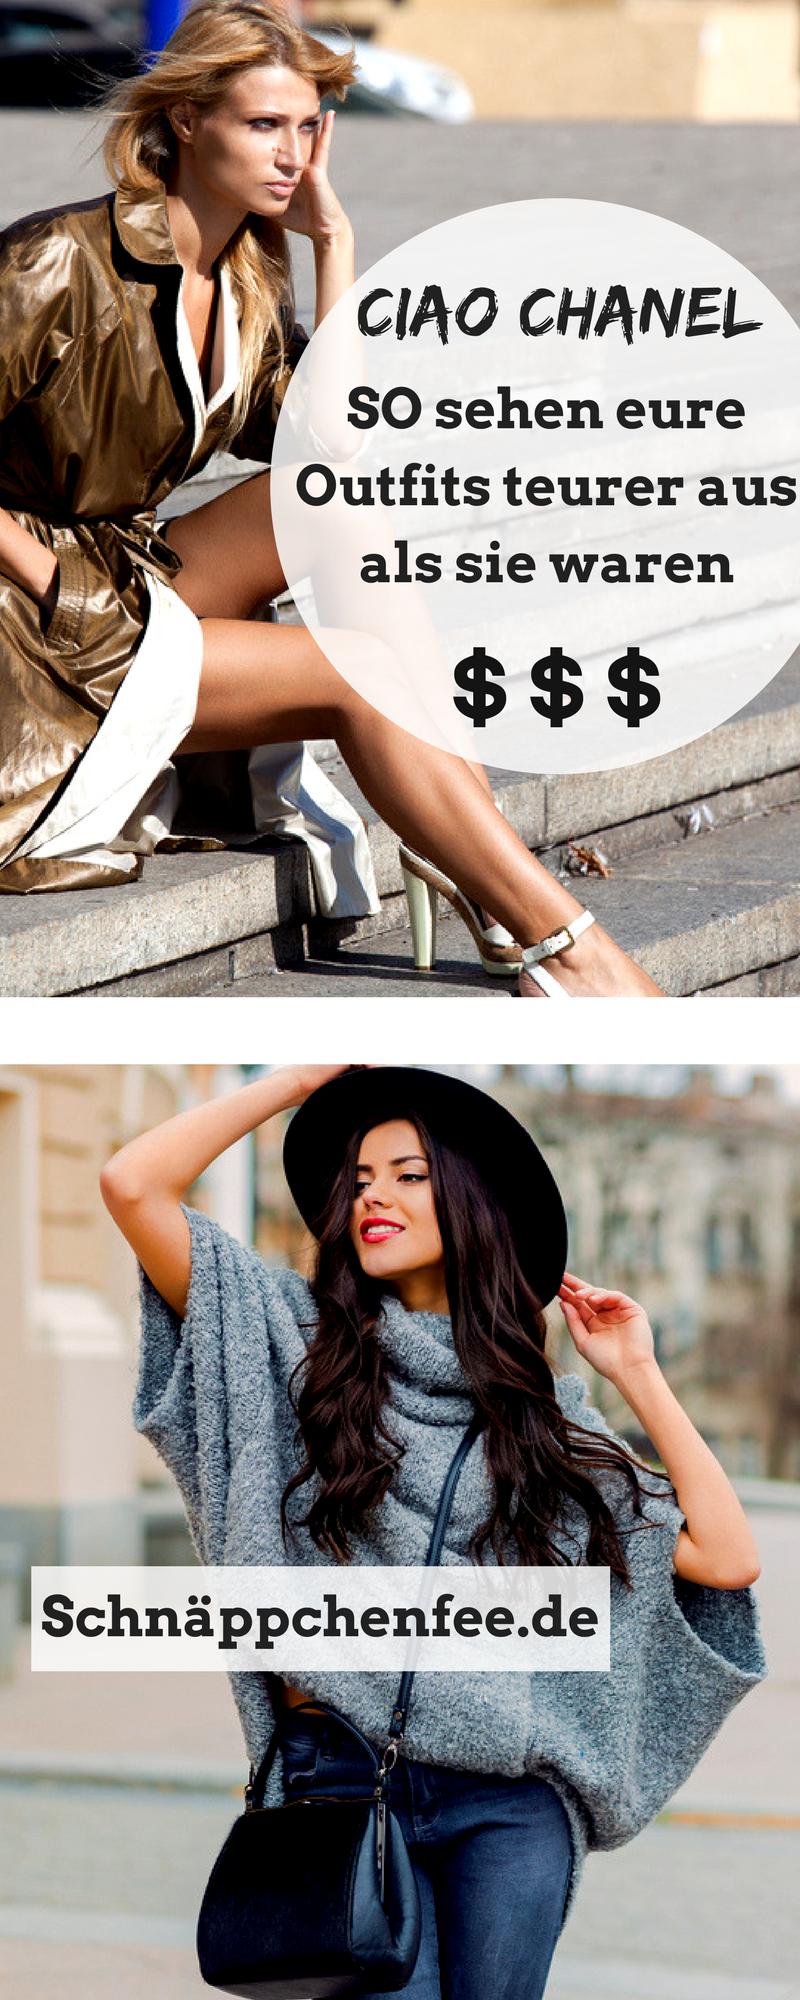 outfits teurer aussehen lassen ist nicht schwer